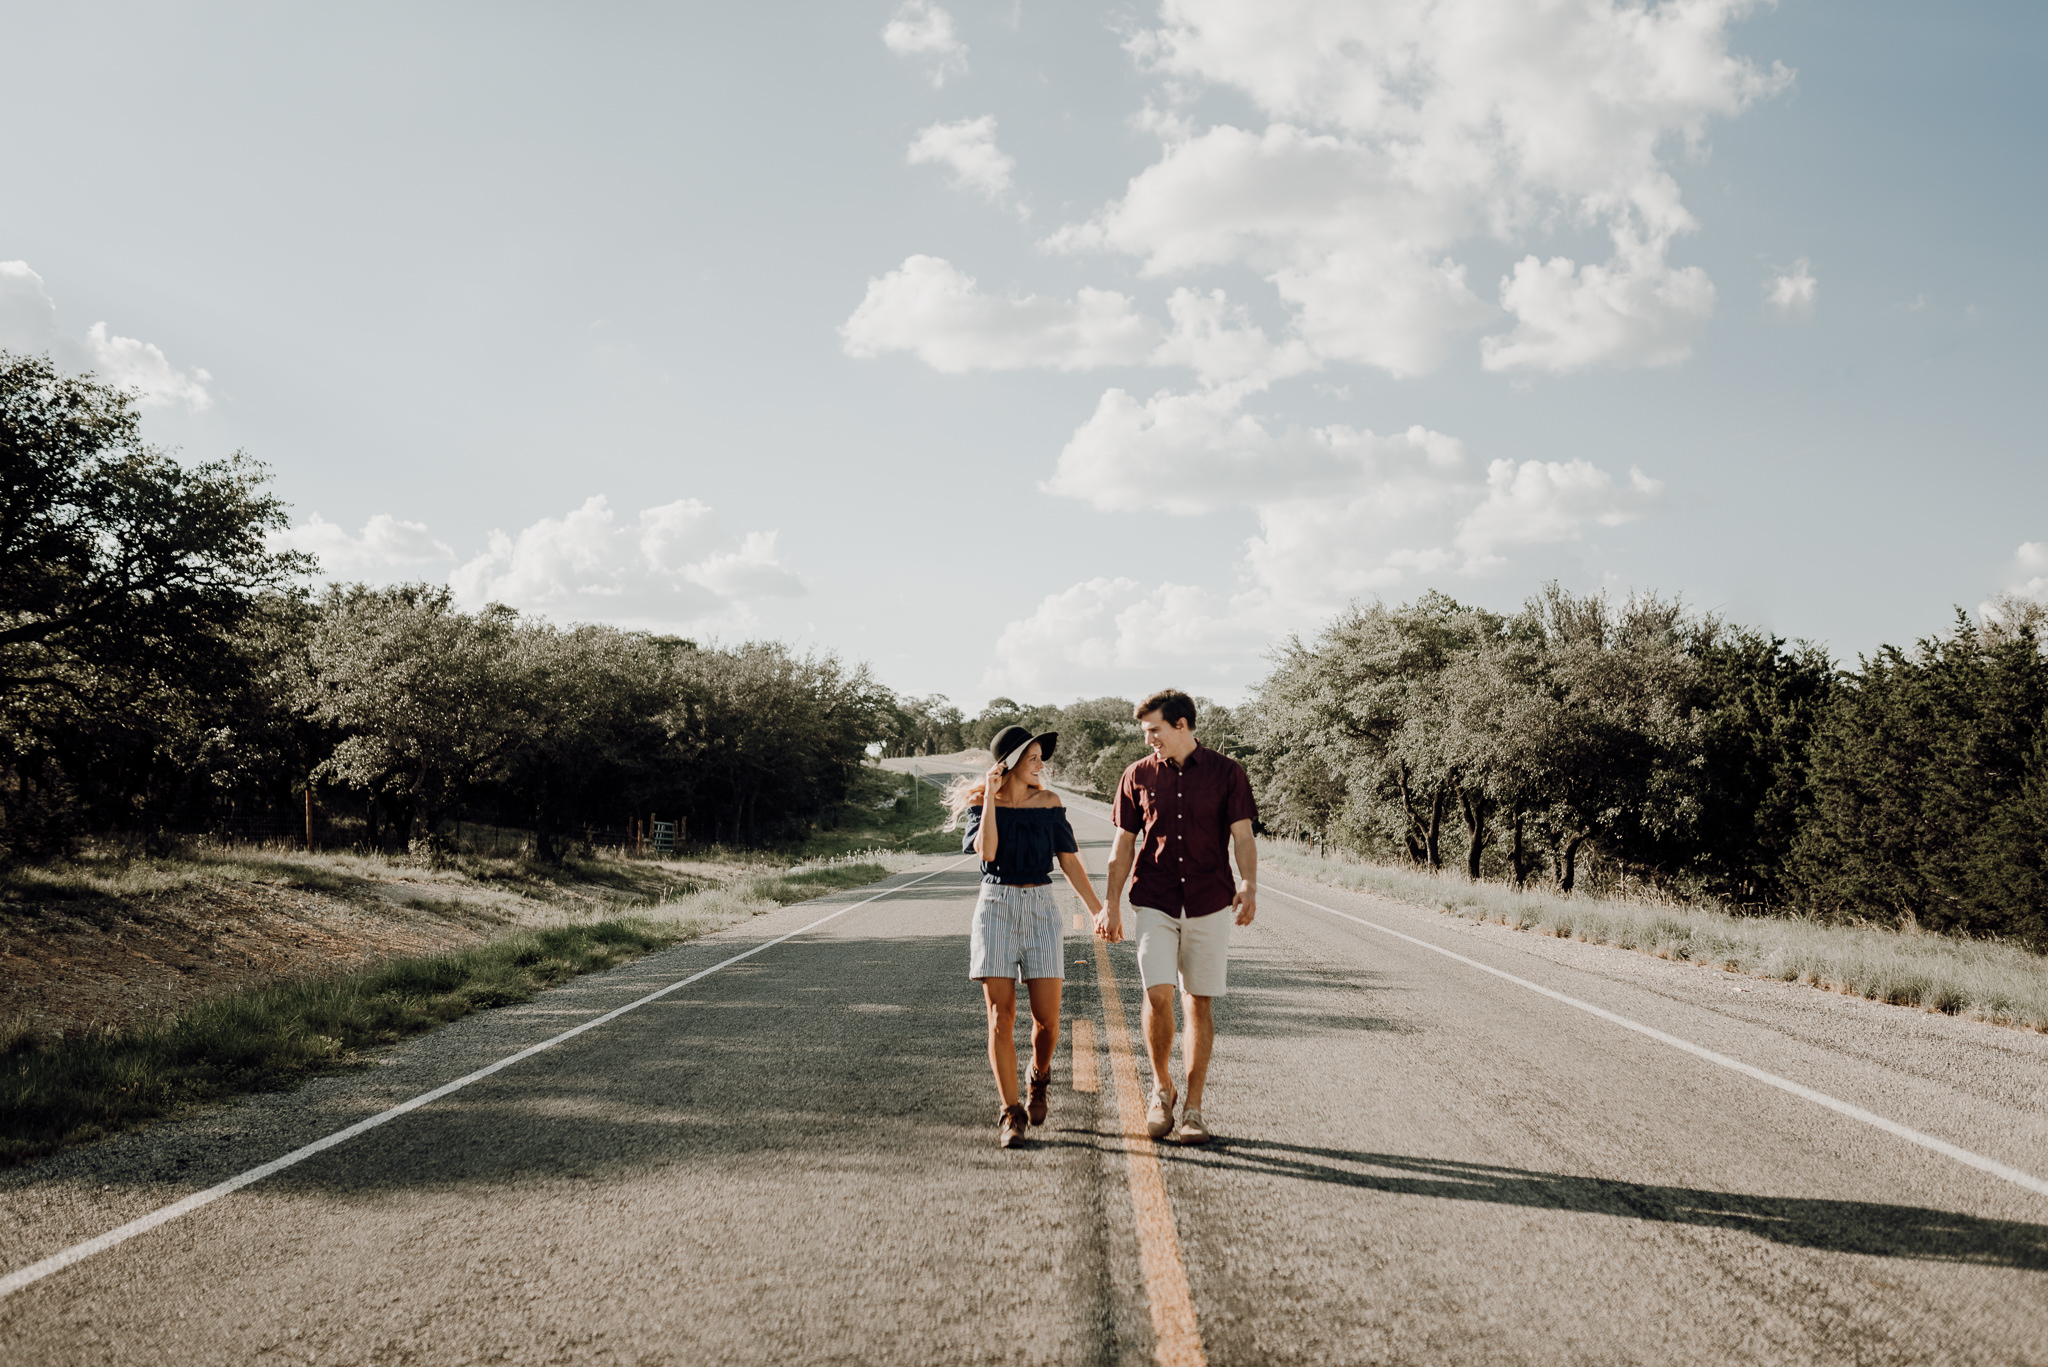 Michelle + Aron | Pederbales Falls Texas Engagement| Kristen Giles Photography - 008.jpg